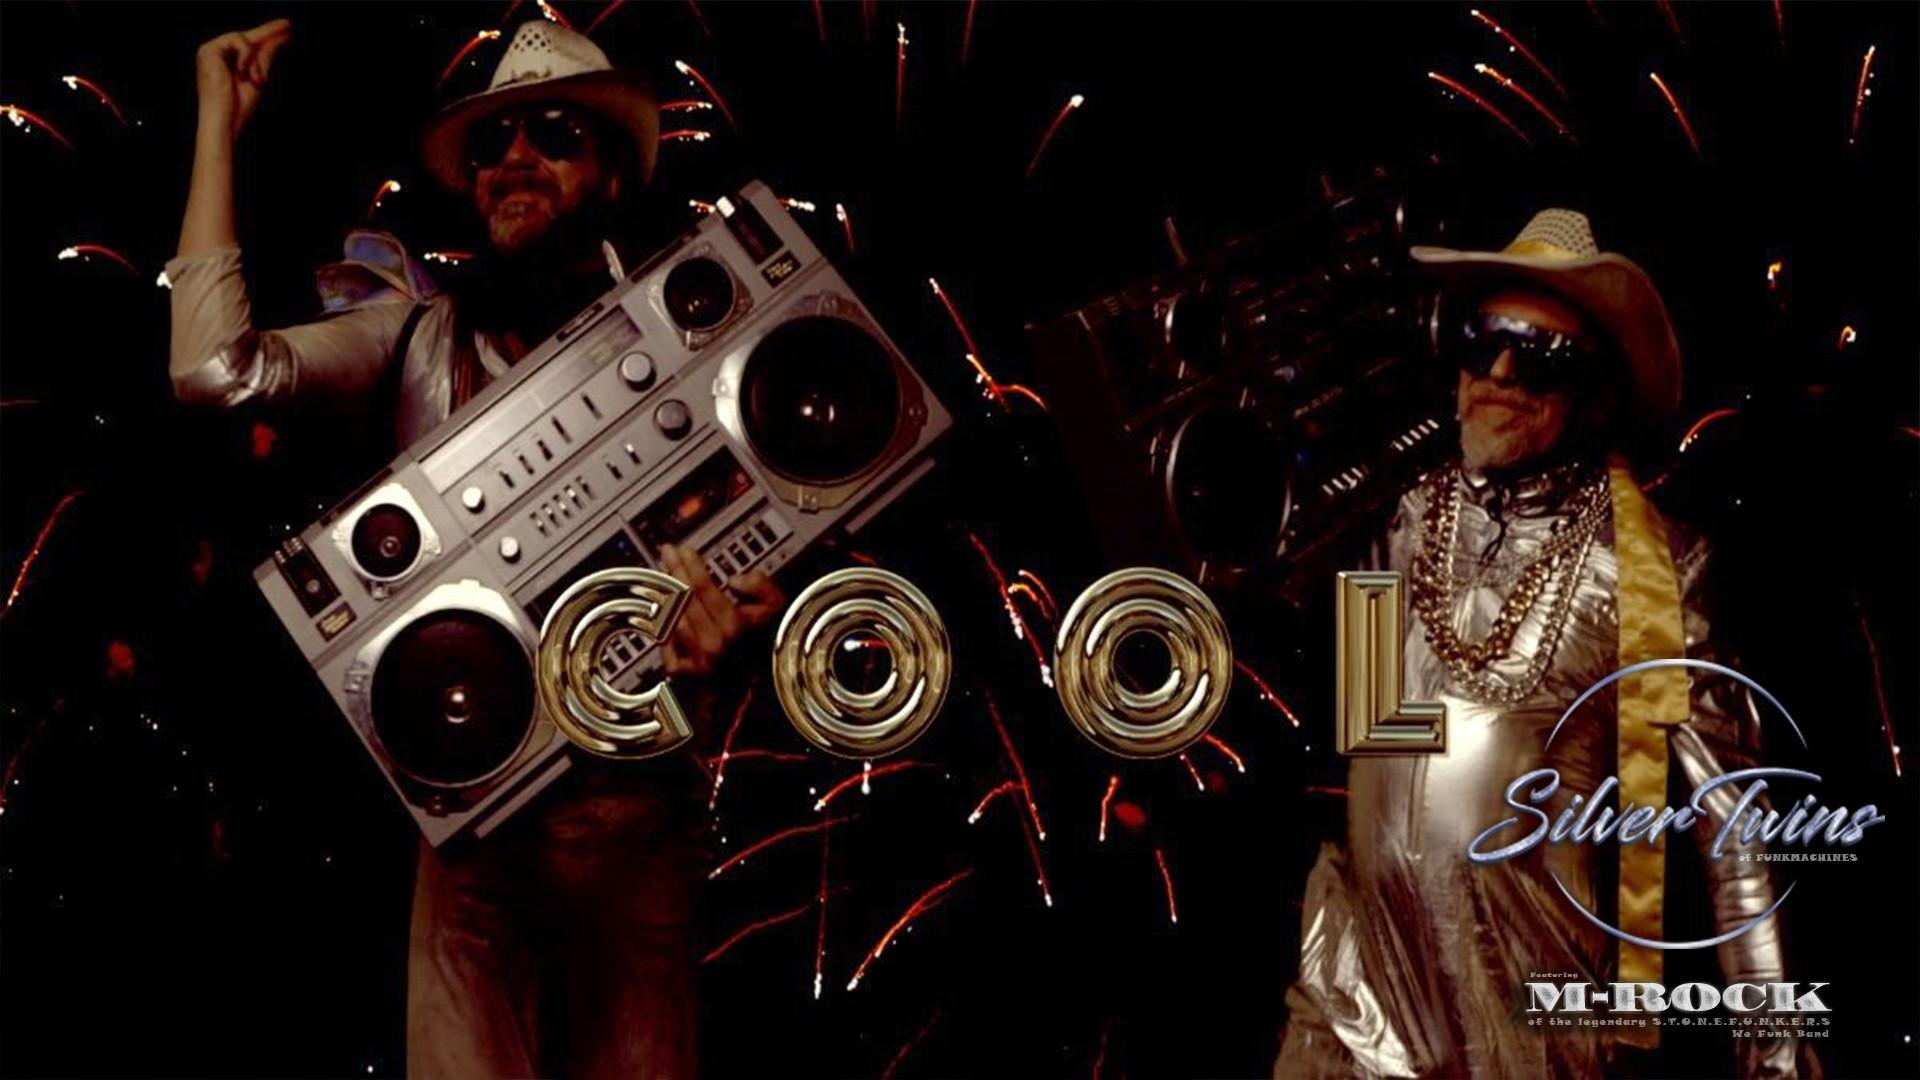 Time SilverTwins of funk COOL MATEE I FJ